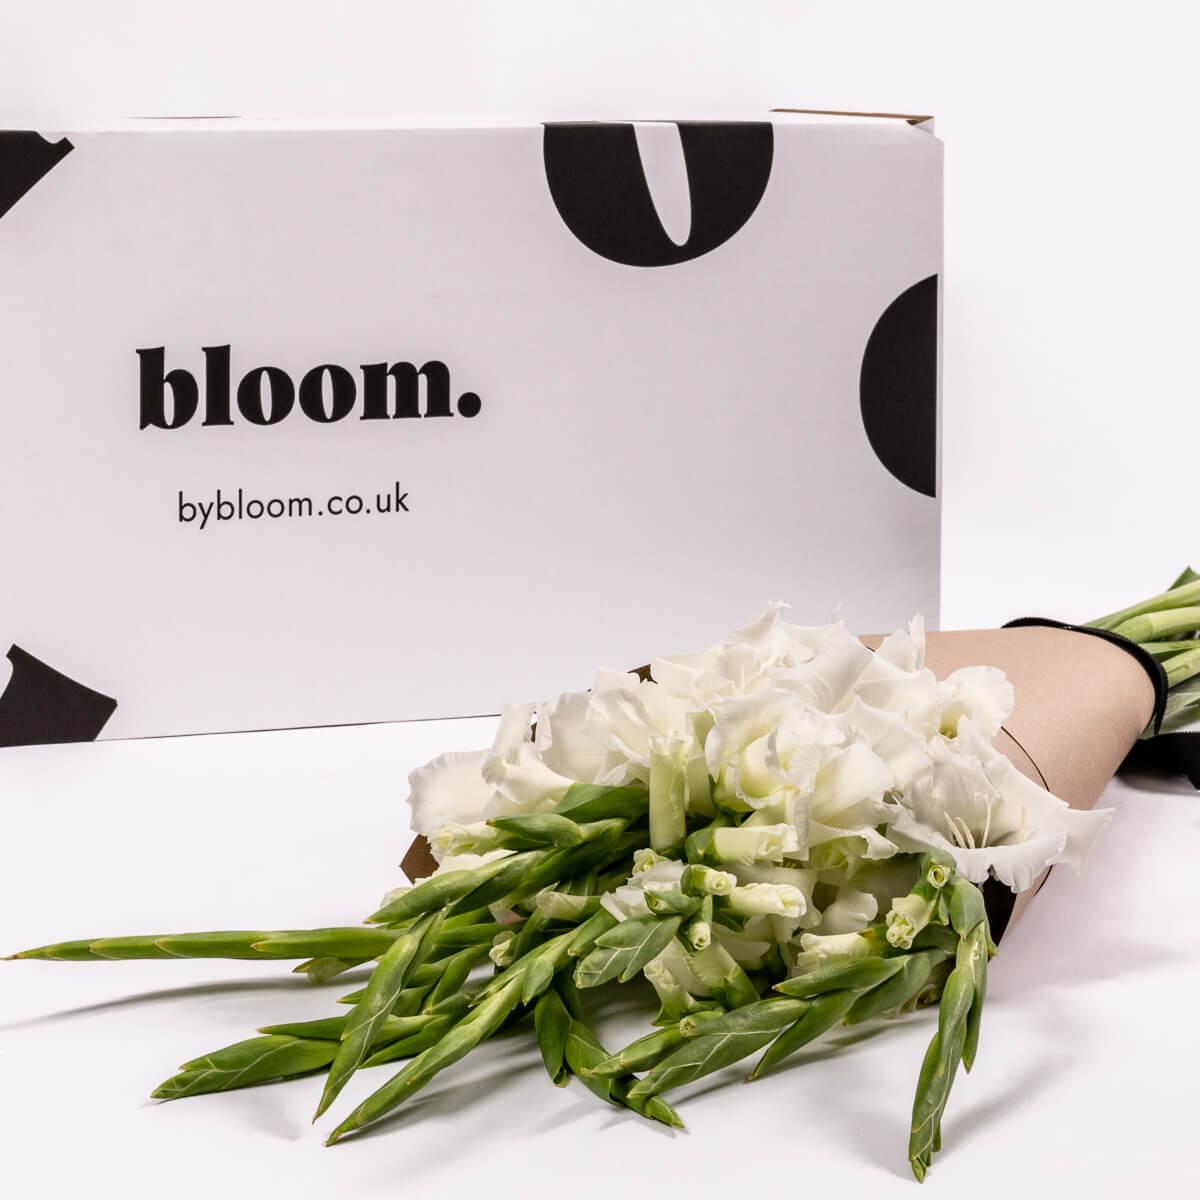 Bloom Flower Delivery | Arctic White Gladioli